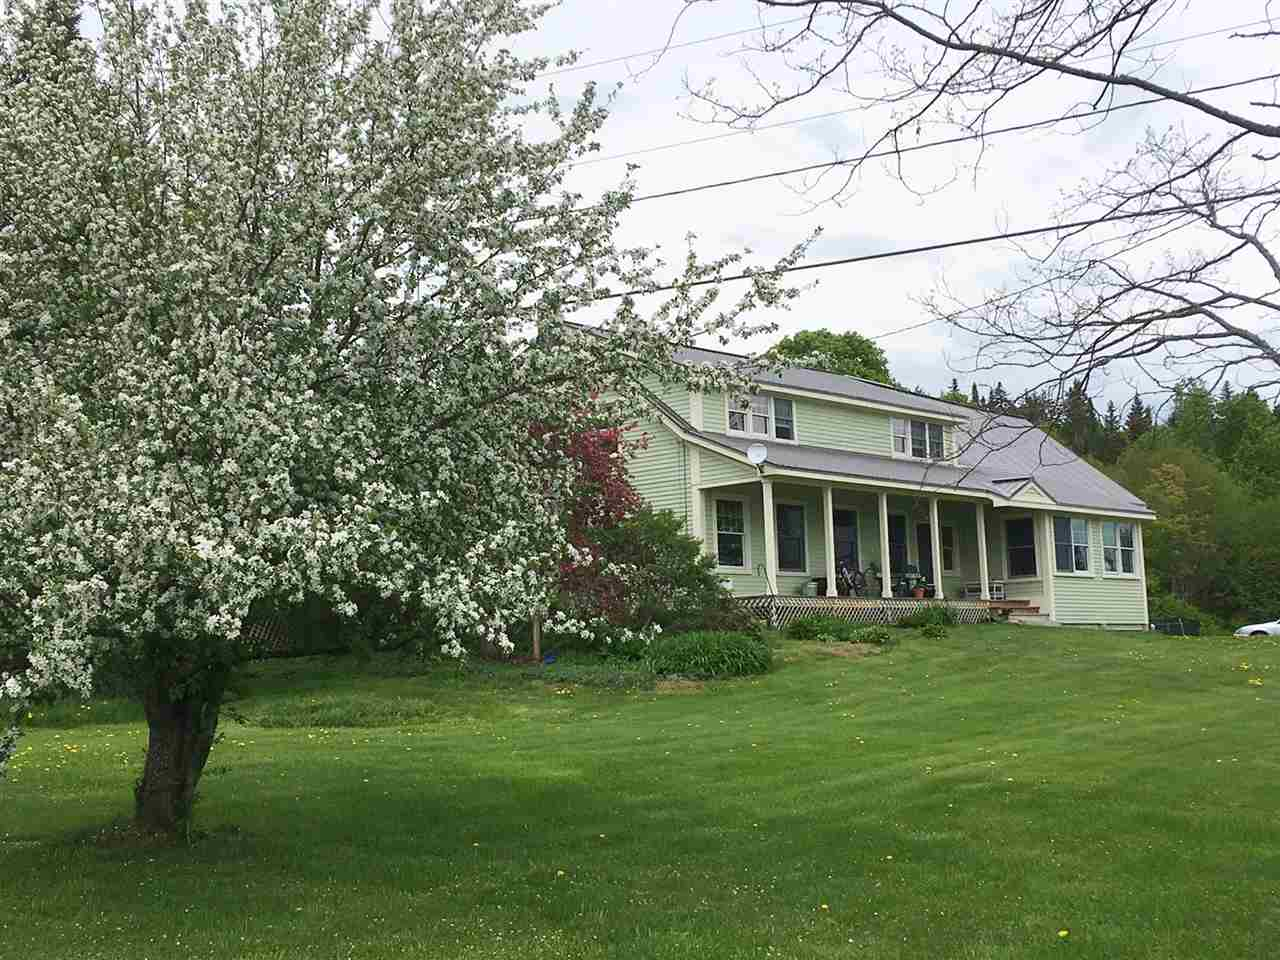 Newark VTHorse Farm | Property  on private stream